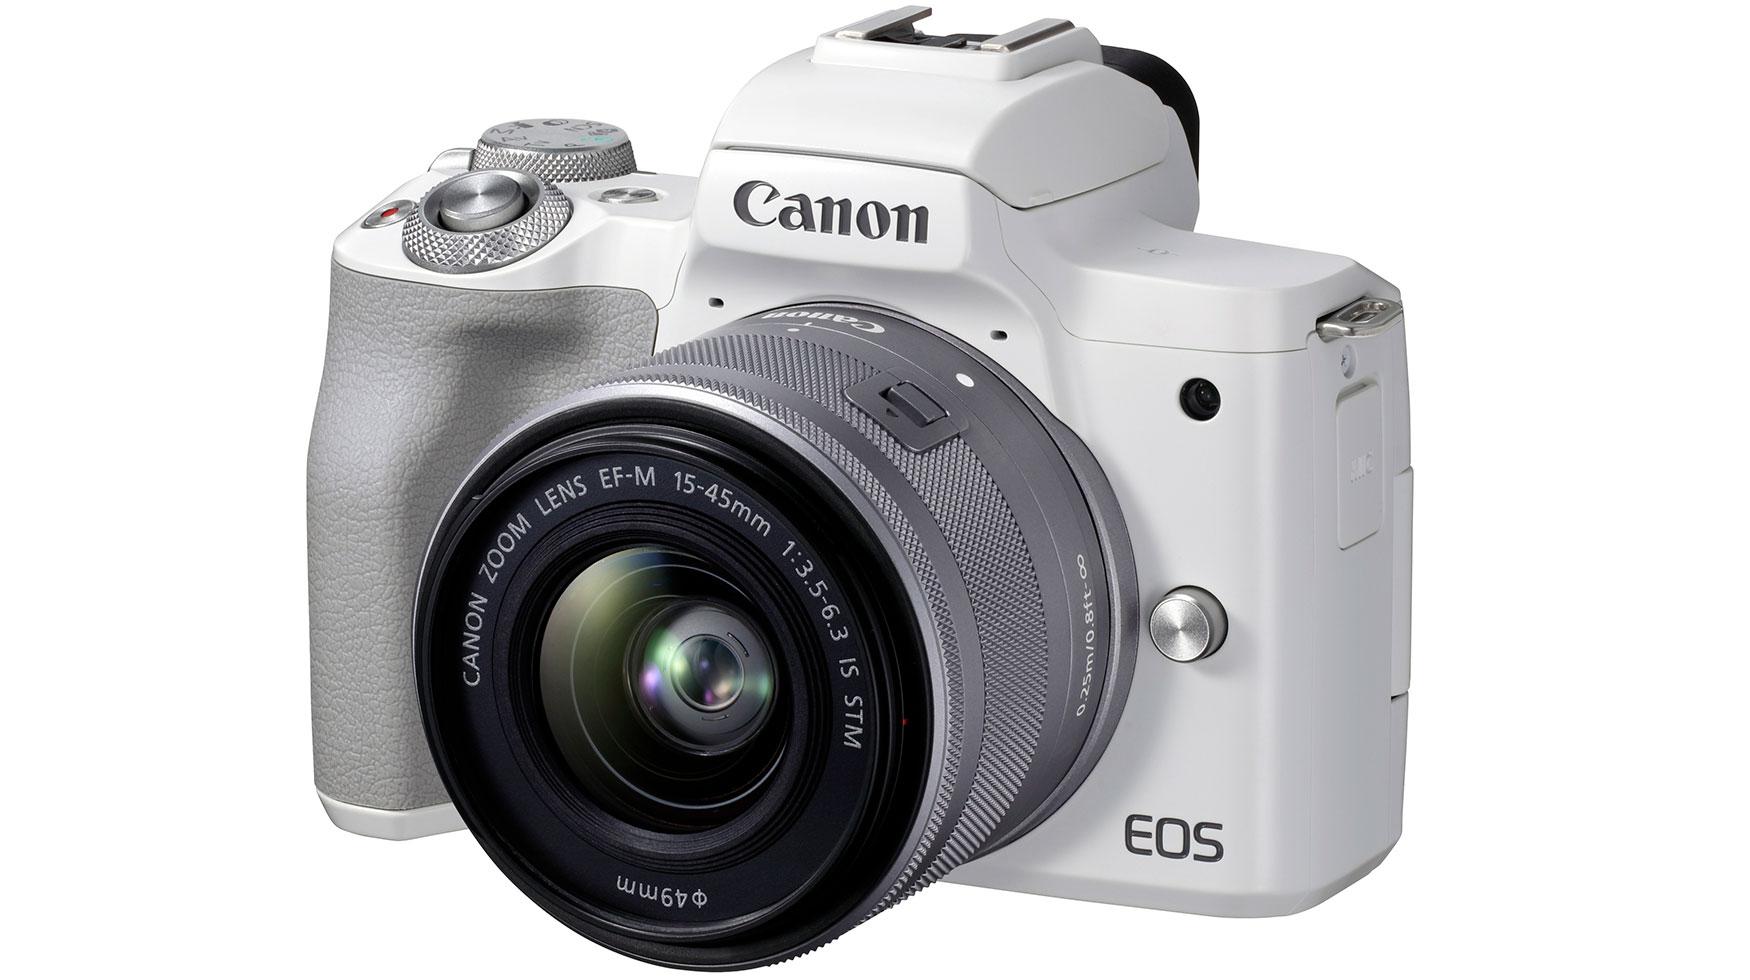 EOS M50 Mark II Mirrorless Digital Camera